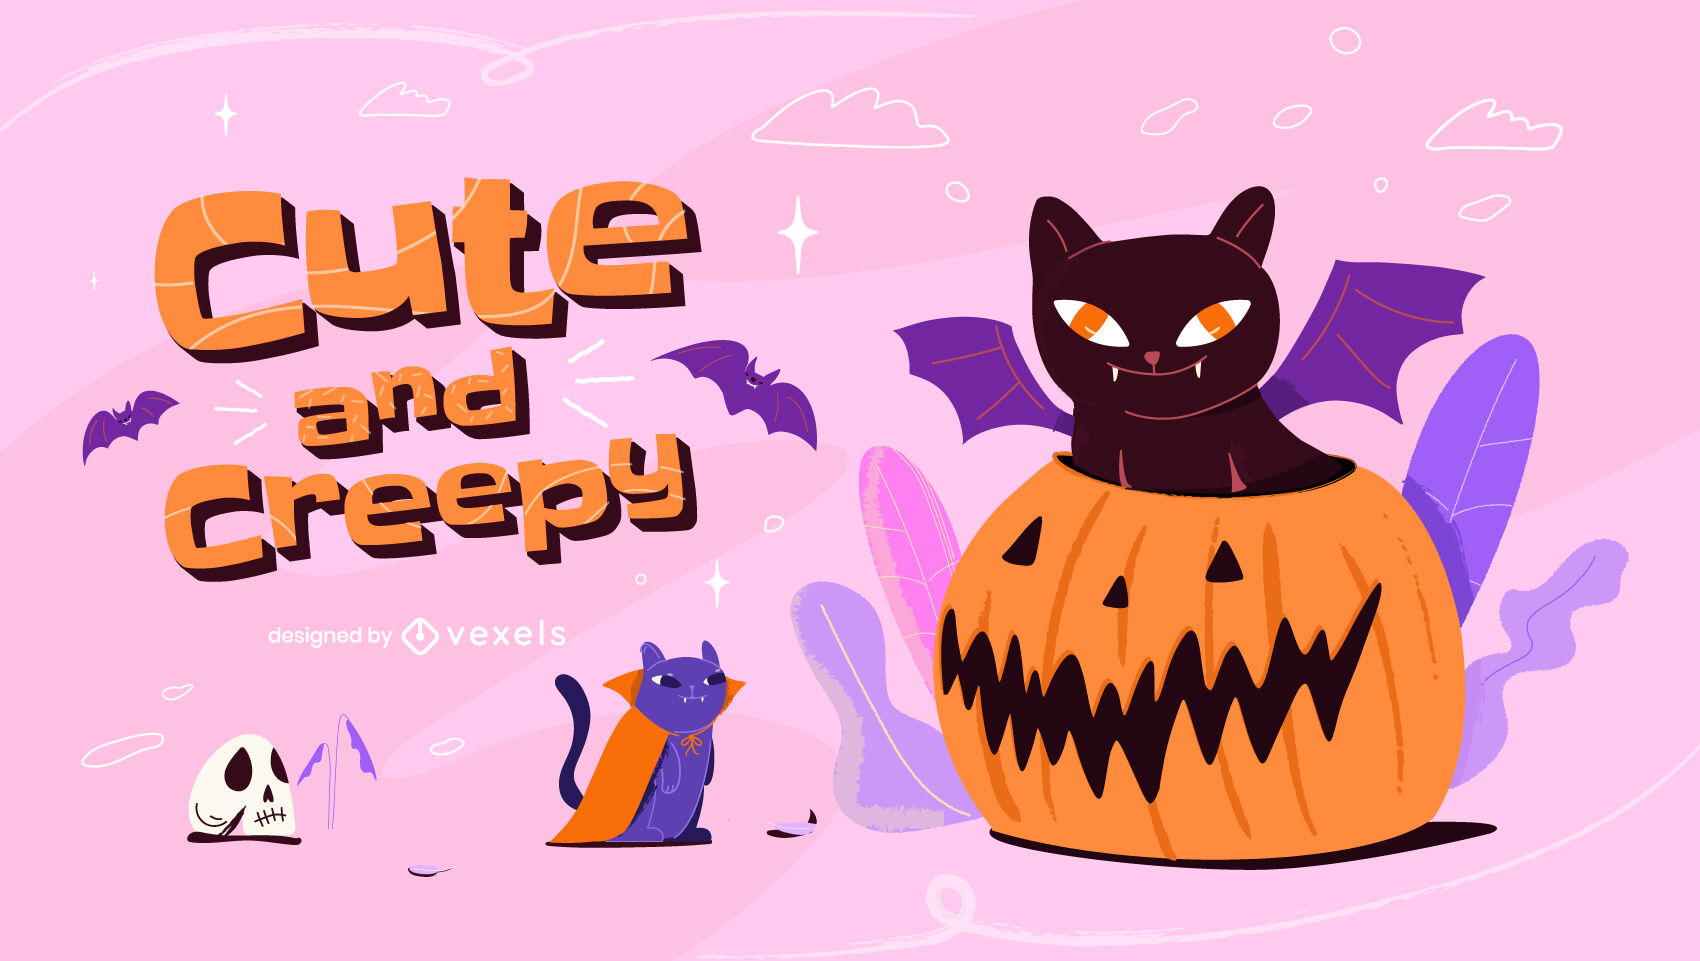 Cute and creepy cat halloween illustration